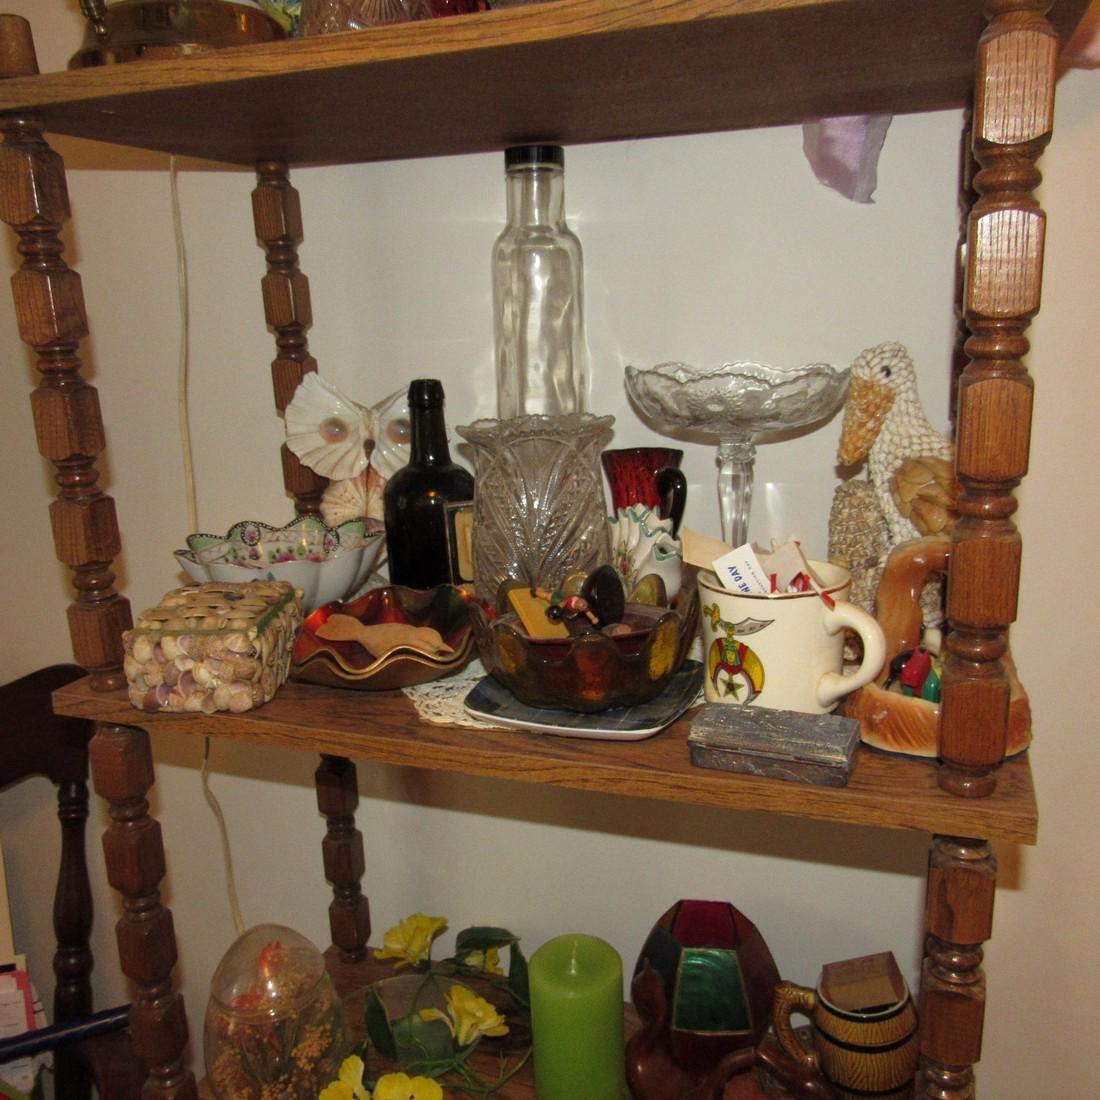 Shelf Chair Knick Knacks Glassware Lot - 3